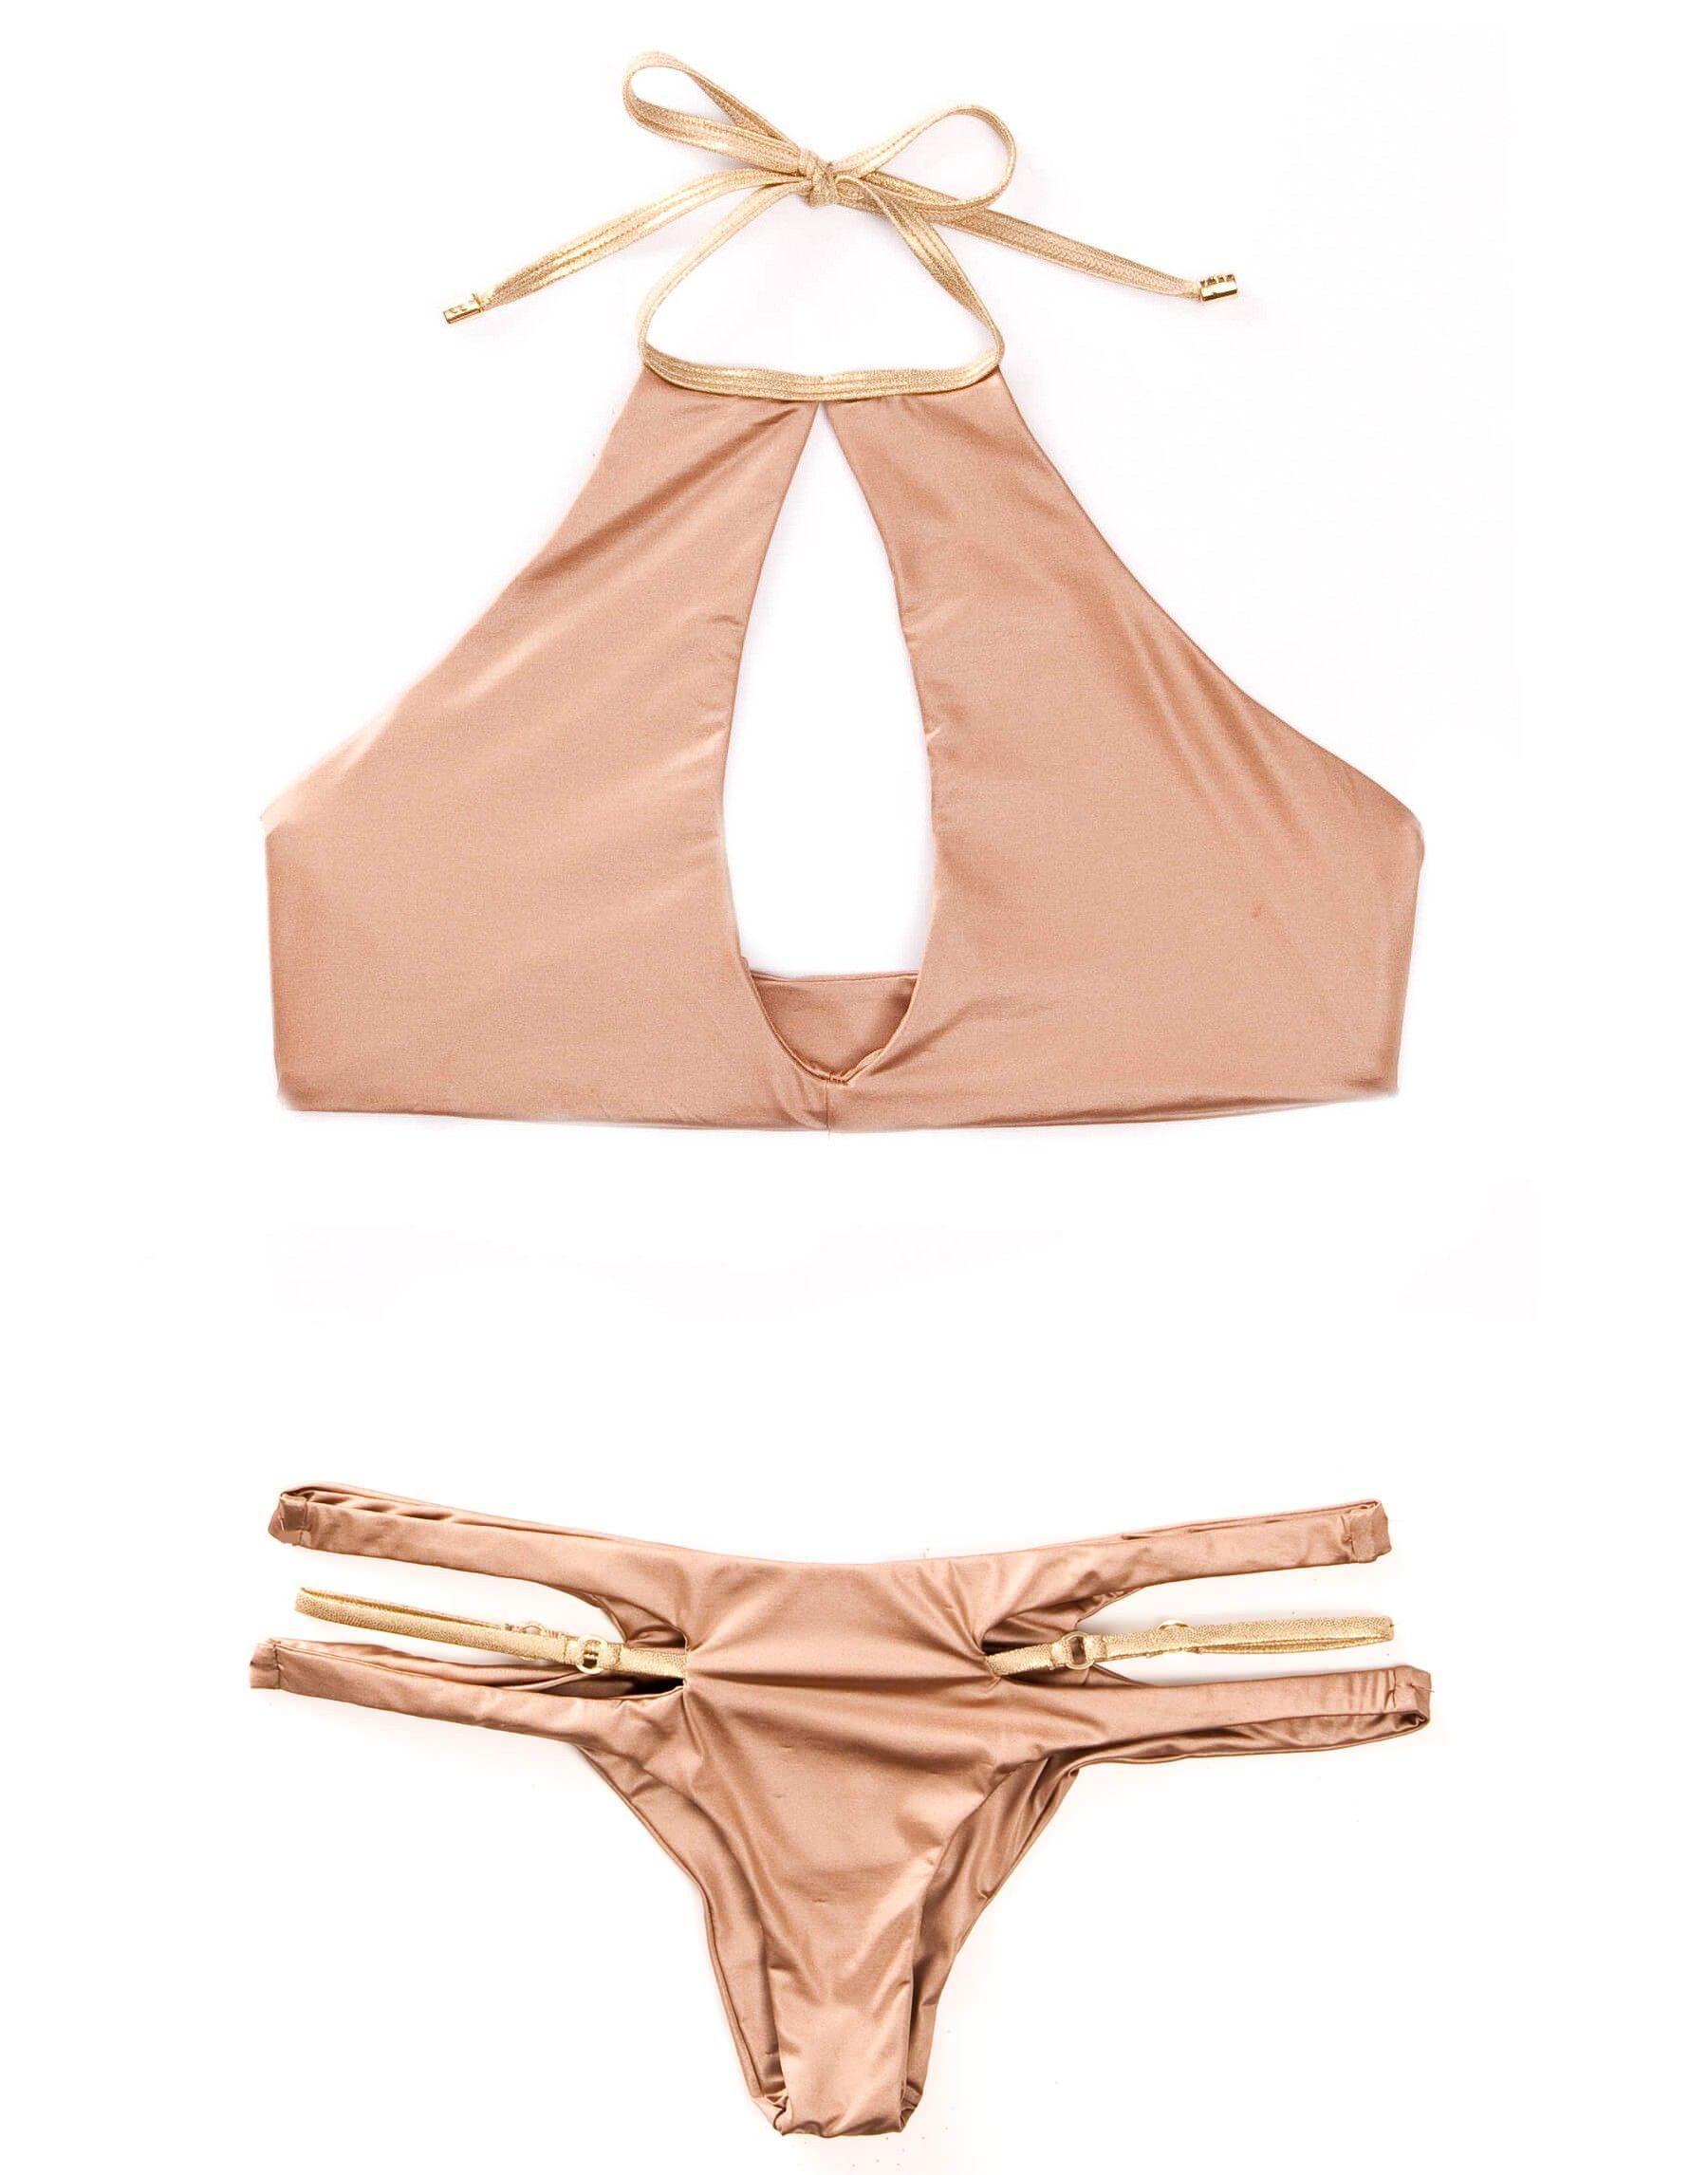 Pin by Mason Lam2 on Lena Radonjic | Keyhole bikini, High ...